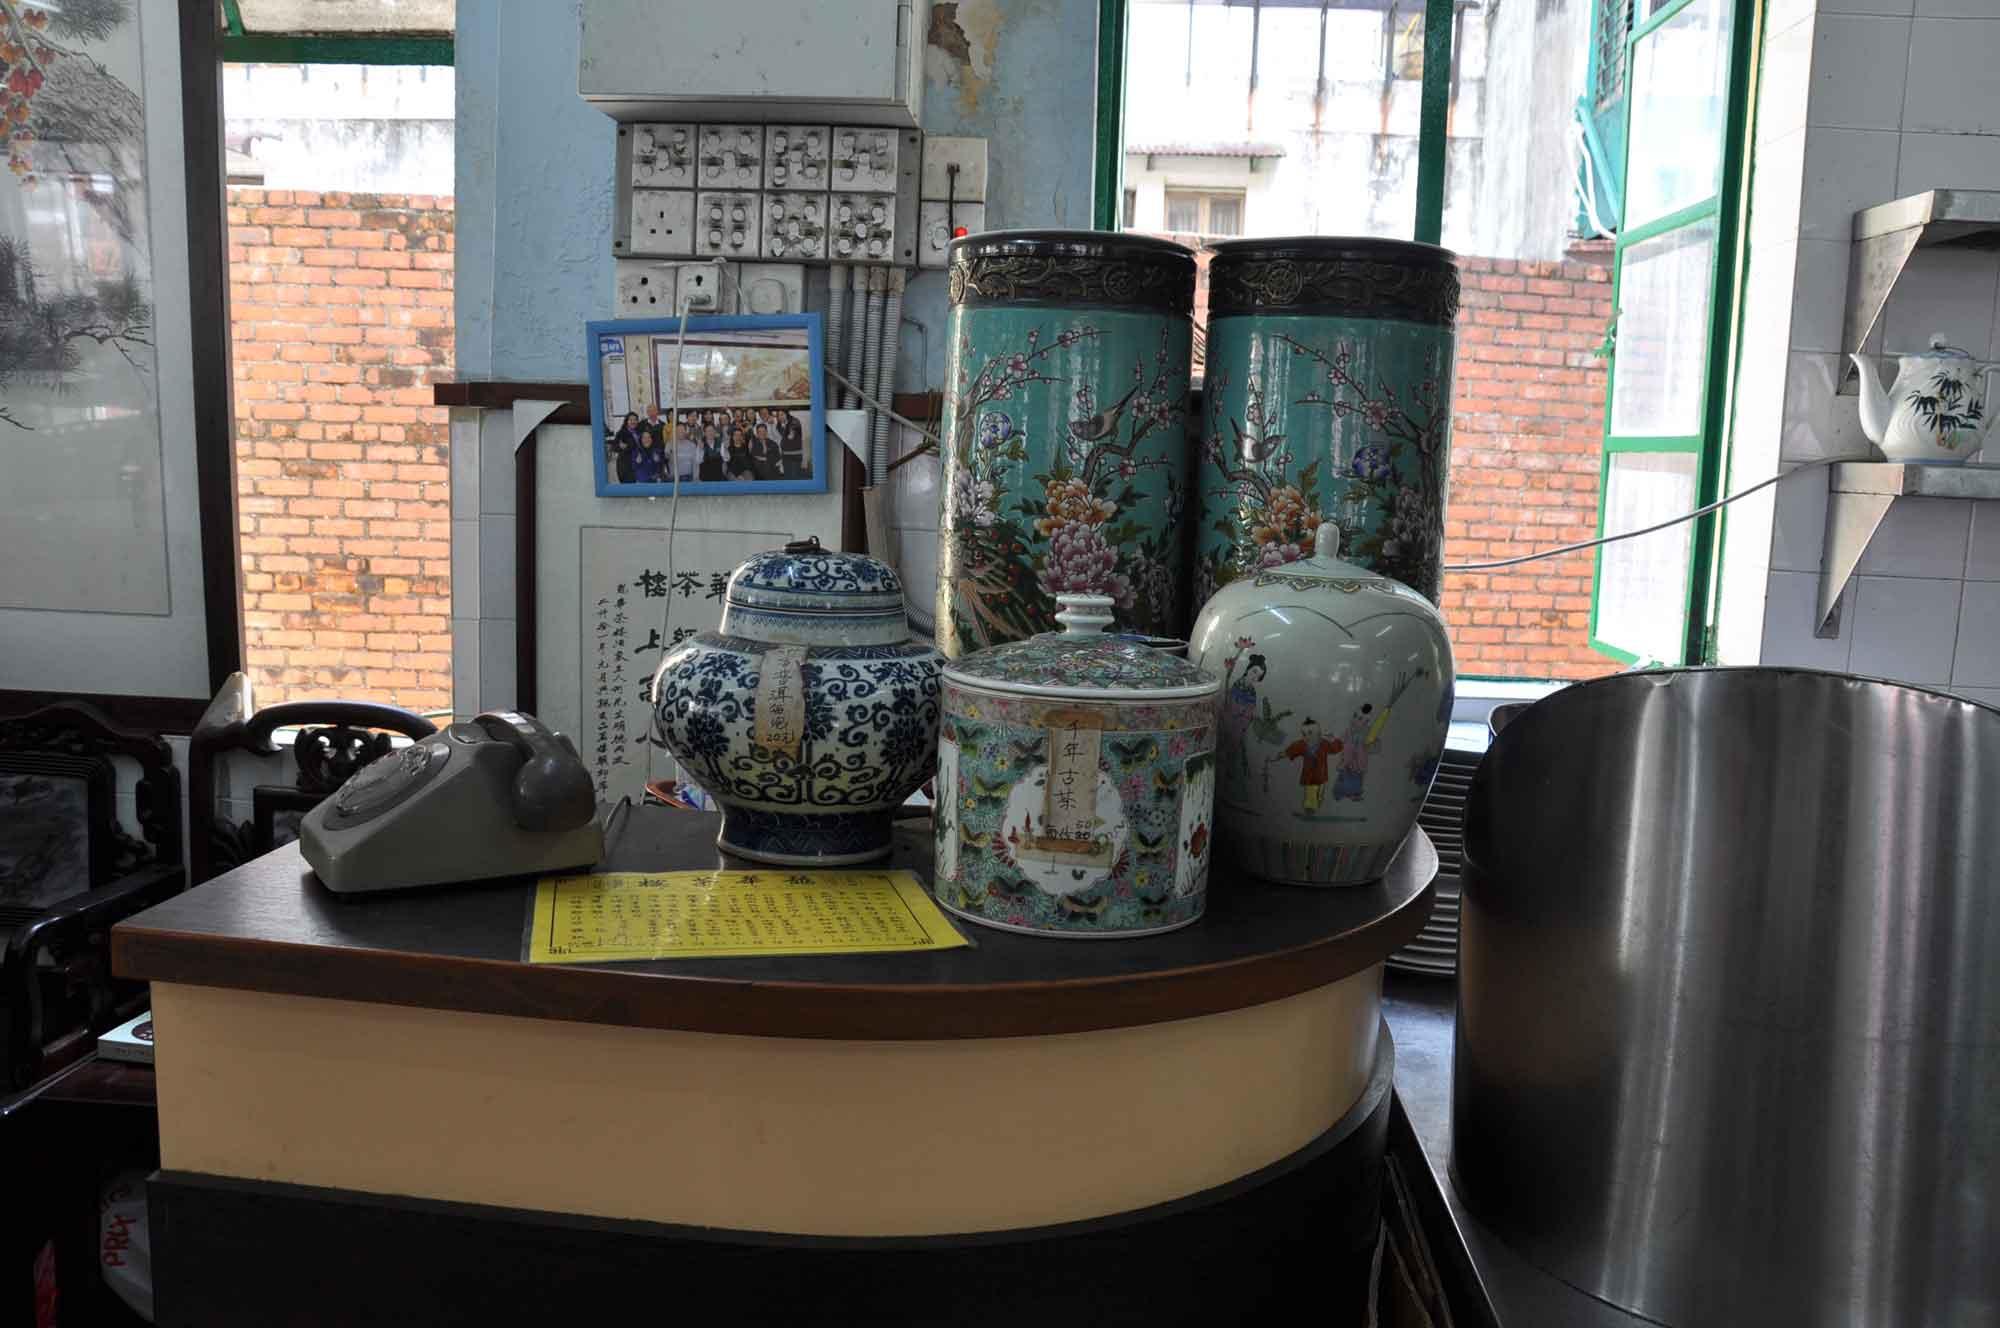 Long Wa Teahouse rotary phone and vases